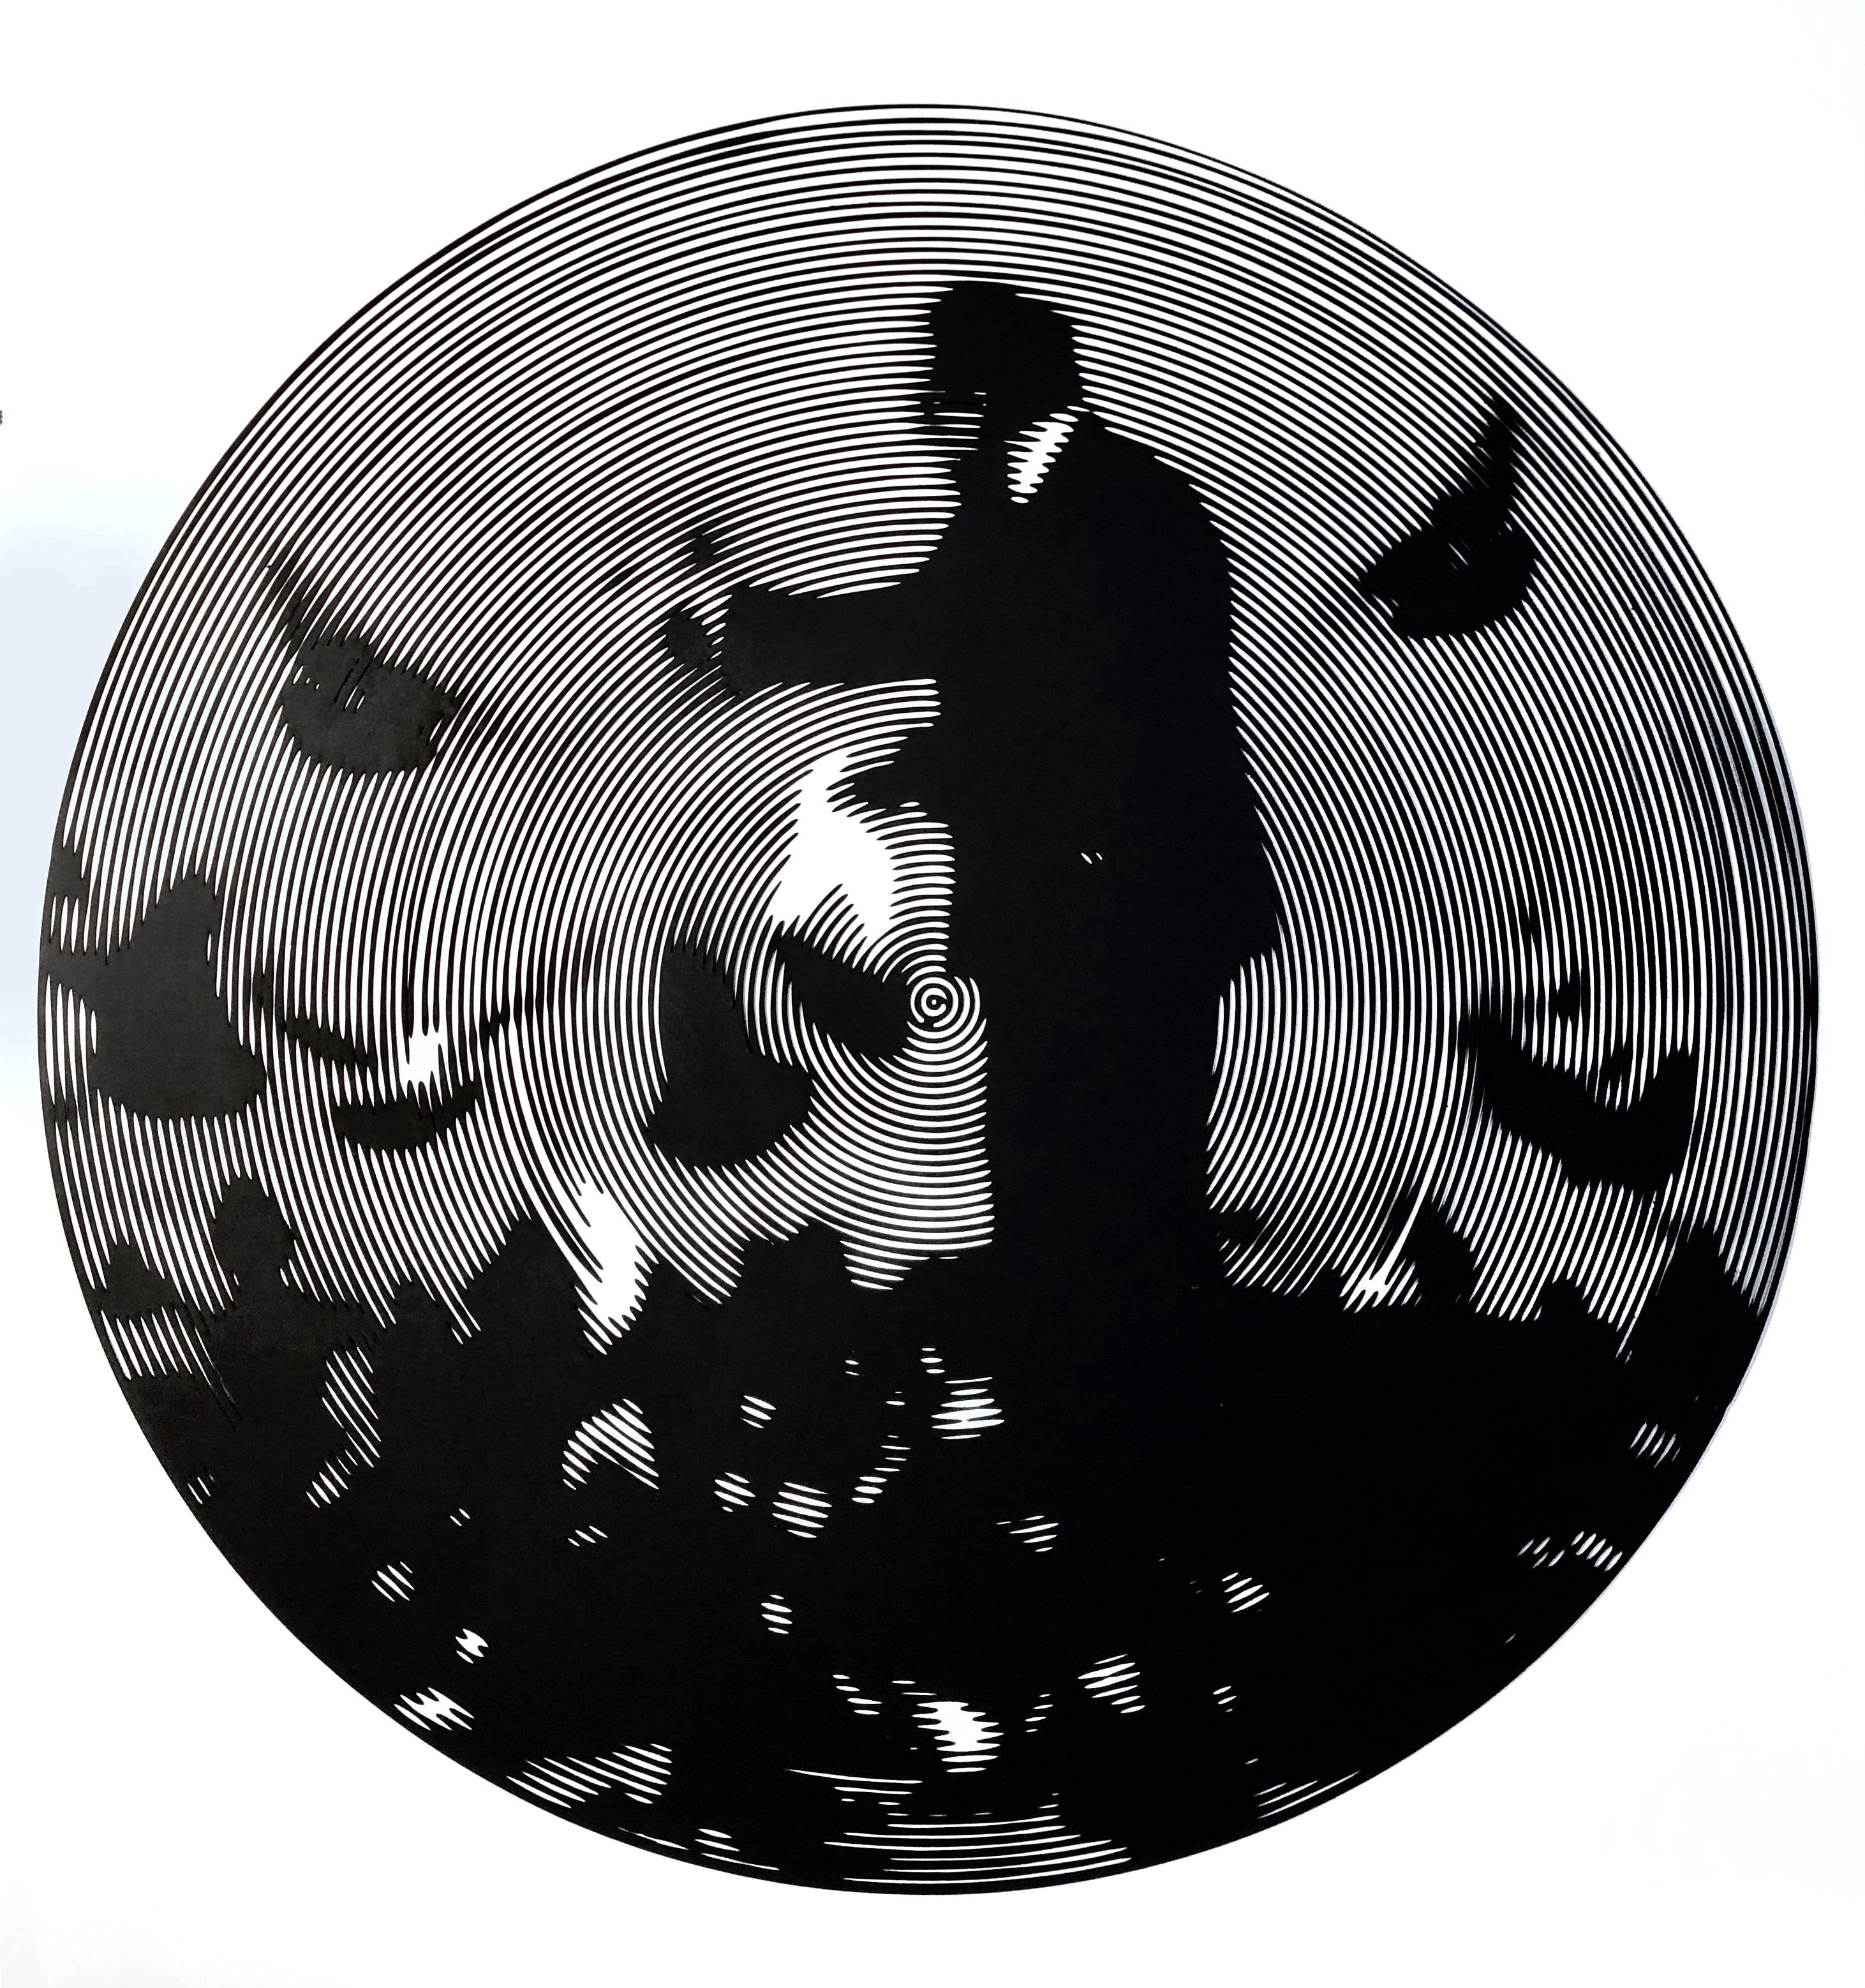 Nelson Gutierrez, Pigeon Man, 2019, 31 inches in diameter, cutout cotton mat board